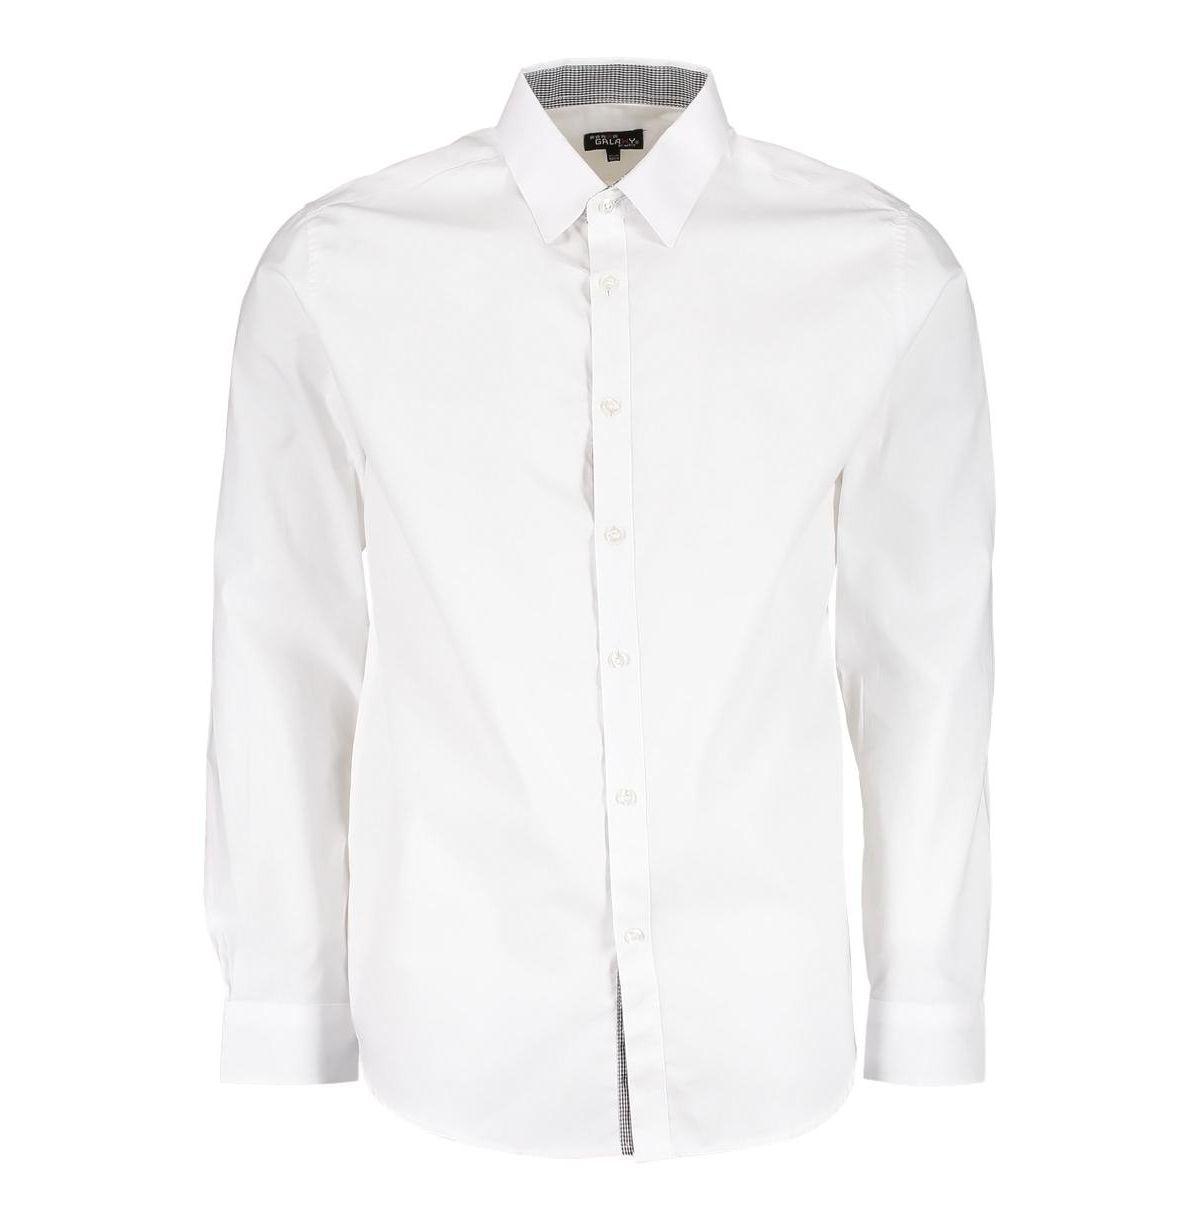 Galaxy By Harvic Mens Long Sleeve Solid Slim Fit Dress Shirts Reviews Casual Button Down Shirts Men Macy S In 2021 White Shirt Men Button Shirts Men Mens Shirt Dress [ 1221 x 1200 Pixel ]